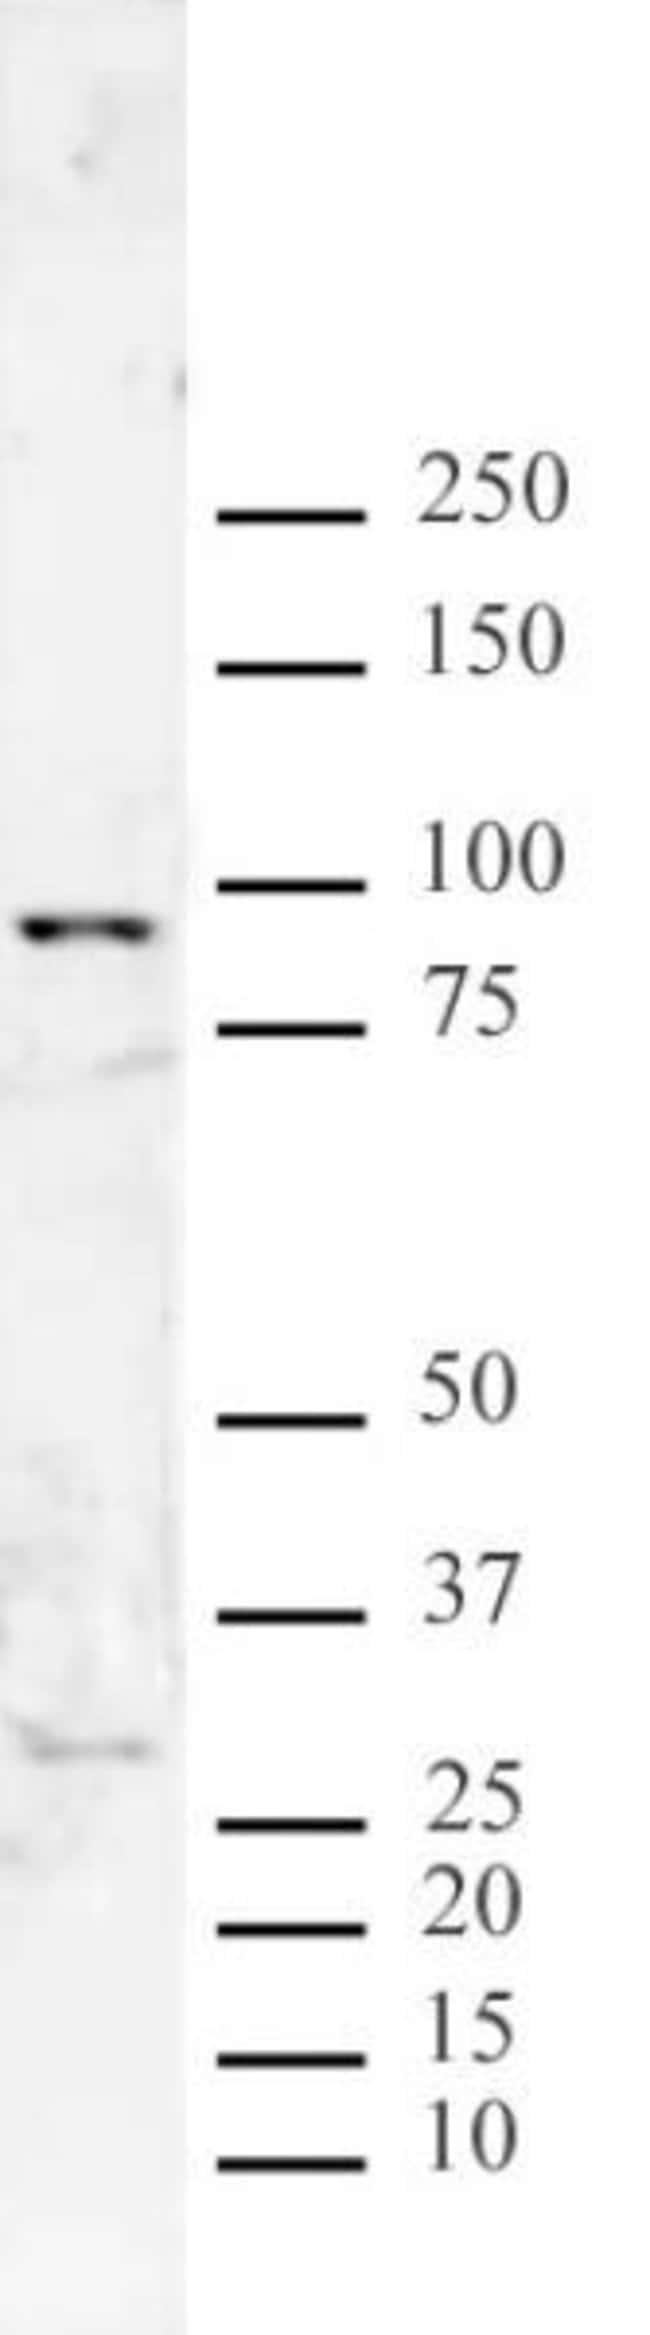 JMJD2F Rabbit anti-Human, Unconjugated, Polyclonal, Active Motif:Antibodies:Primary